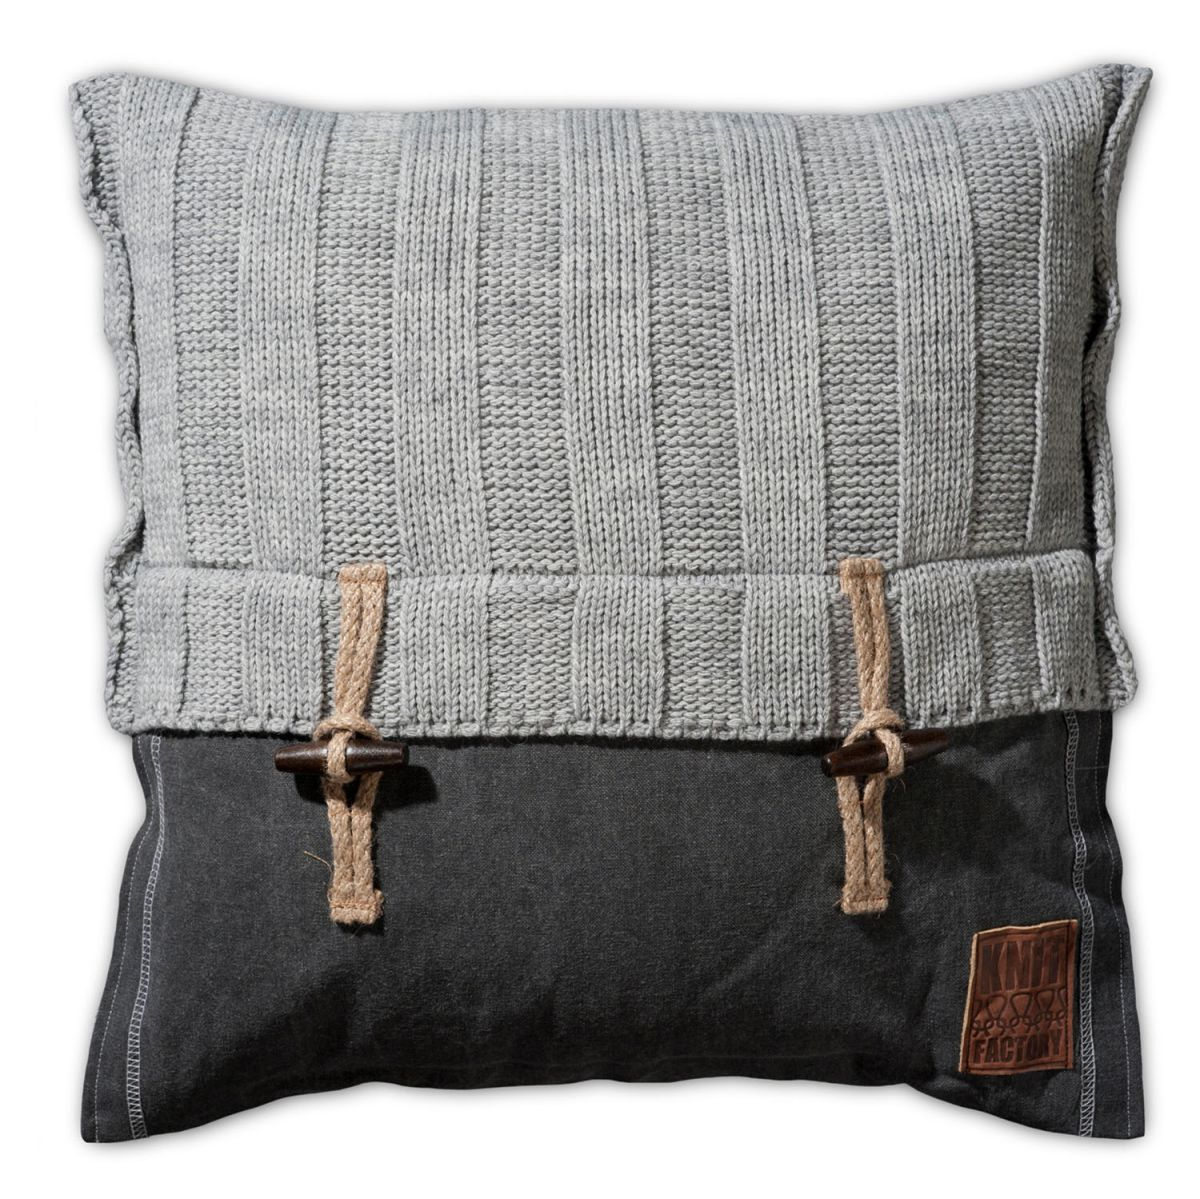 knit factory 1121211 kussen 50x50 6x6 rib licht grijs 1